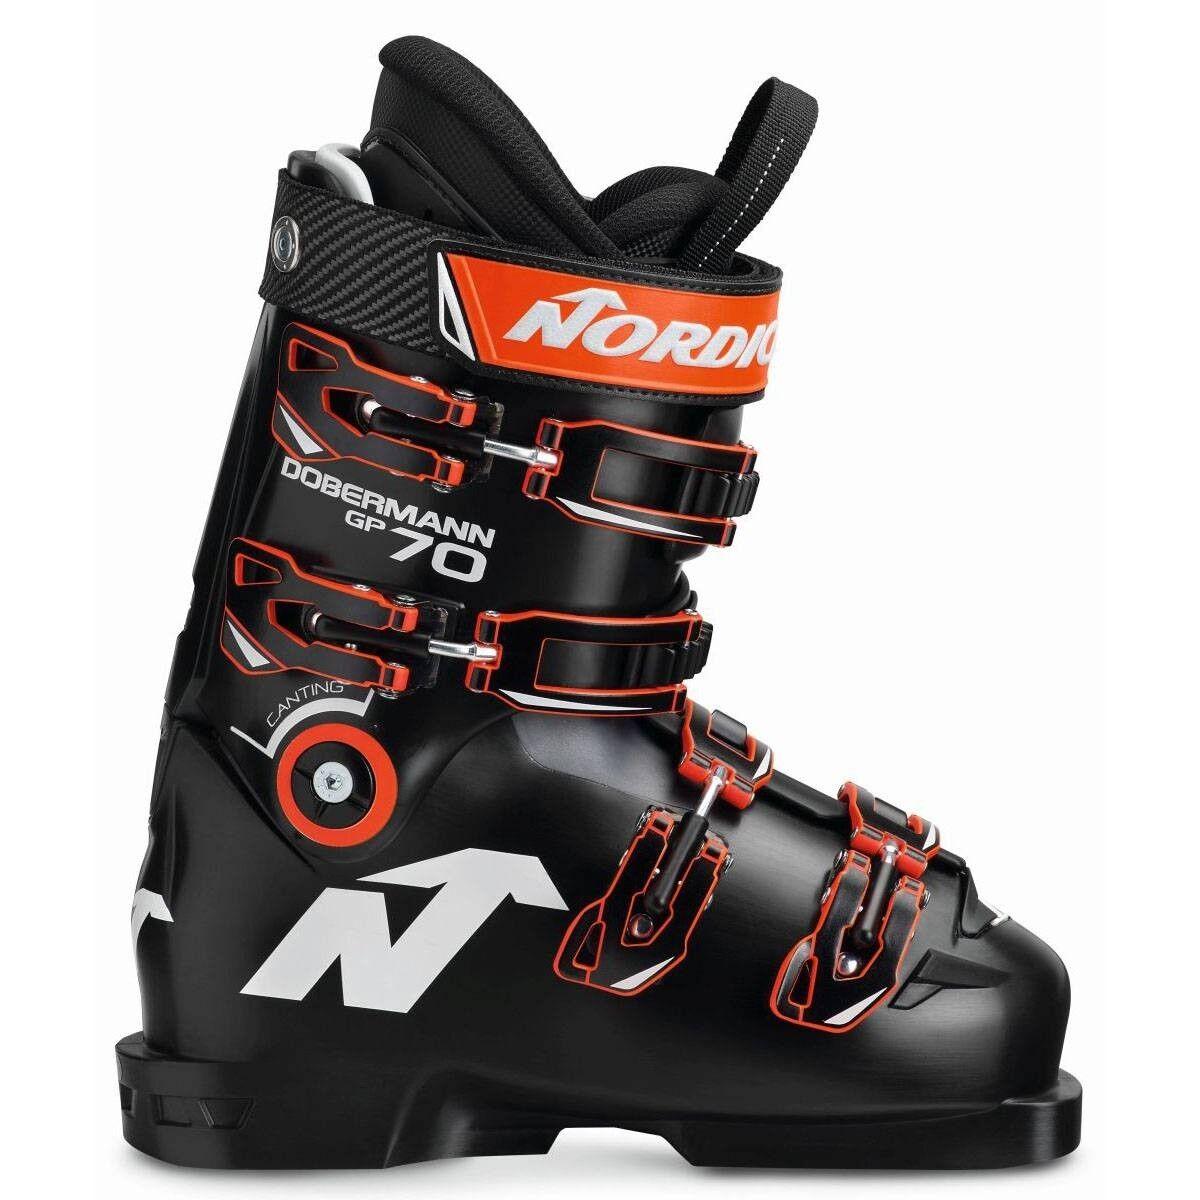 NORDICA DOBERMANN GP 70 scarponi da donna Nero